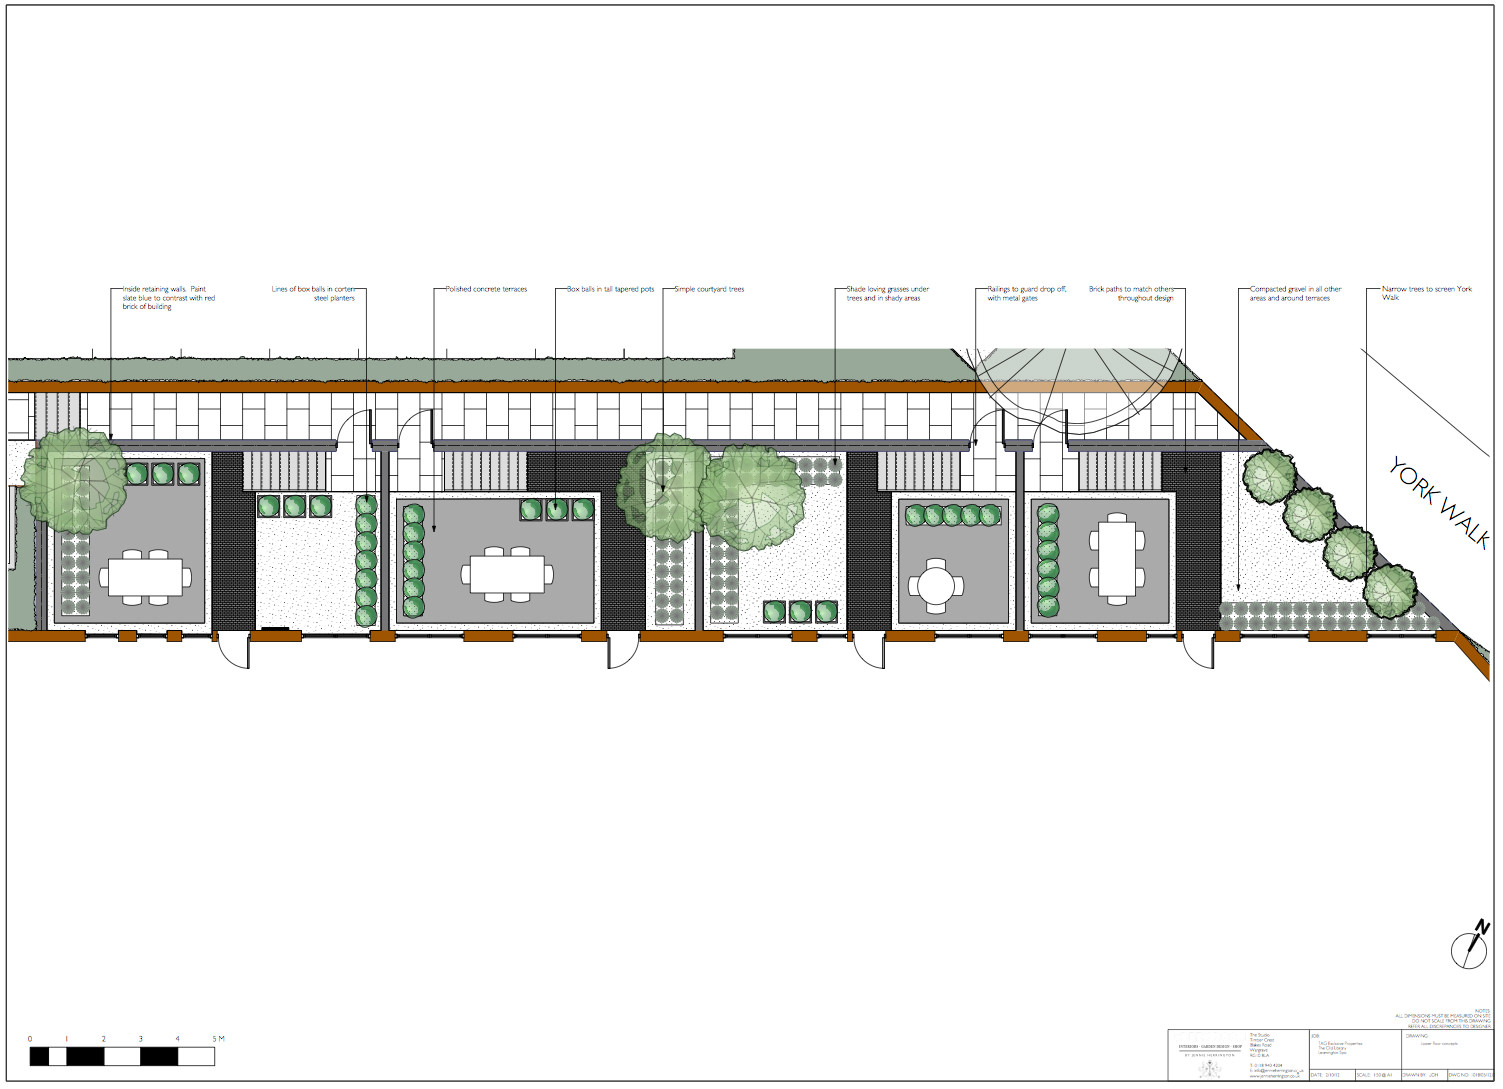 TOL-lower-courtyard-layout.jpg